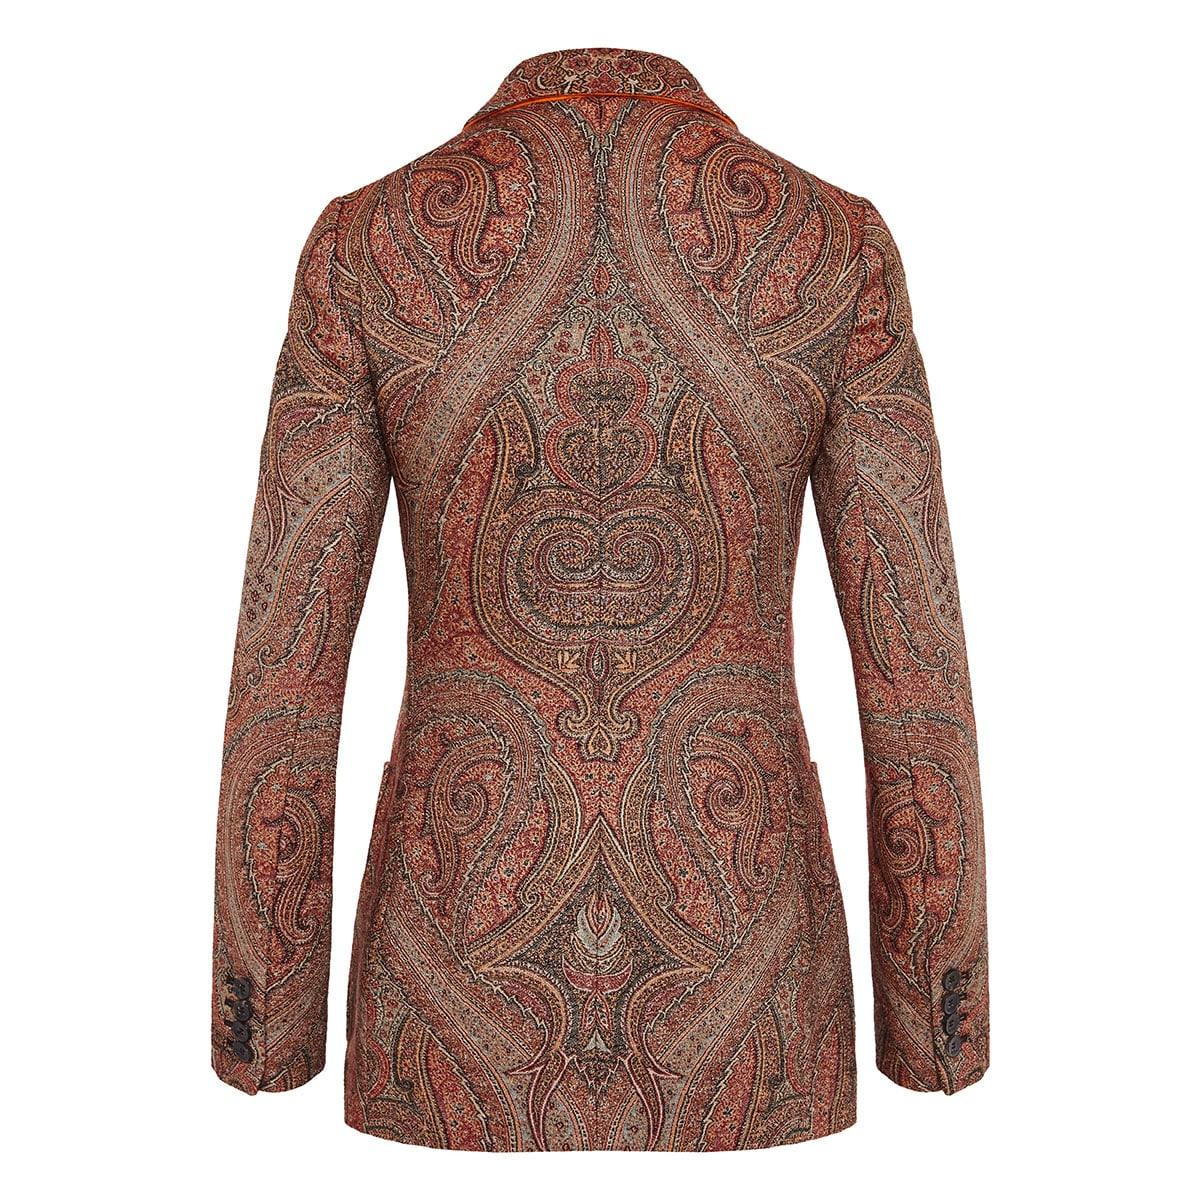 Paisley single-breasted jacquard blazer